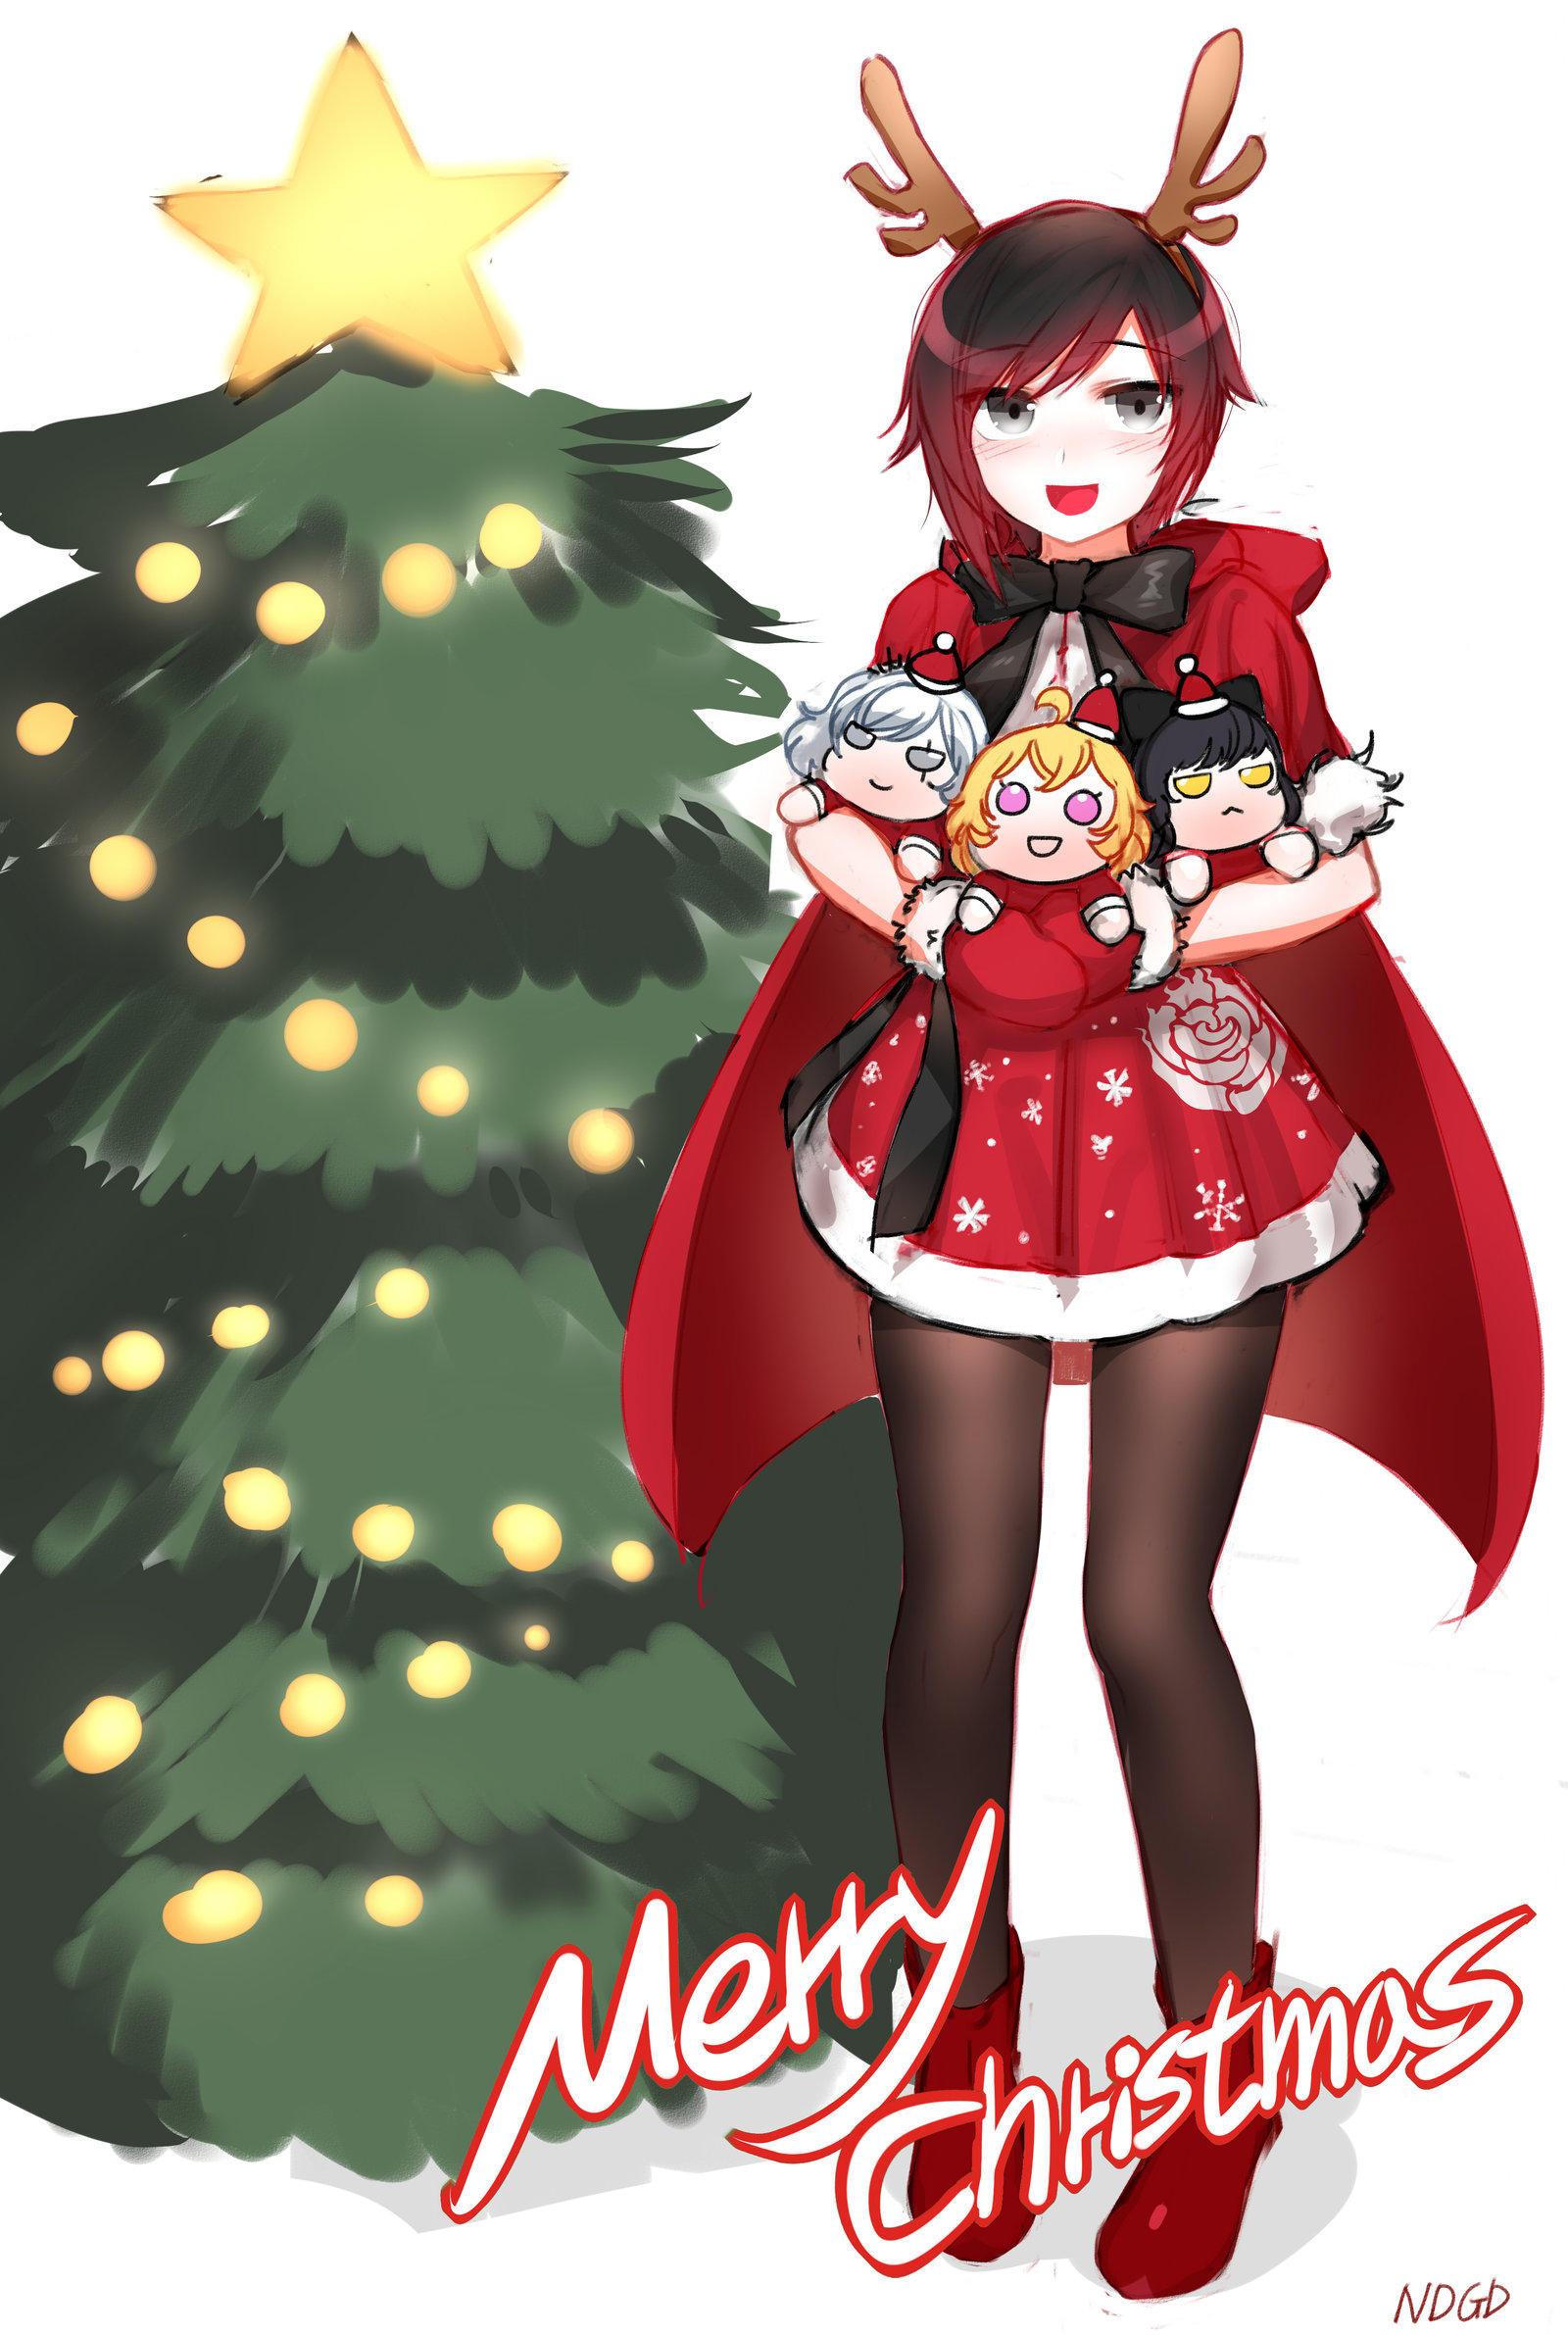 Naruto Team 7 Wallpaper Cute Merry Christmas Rwby Know Your Meme